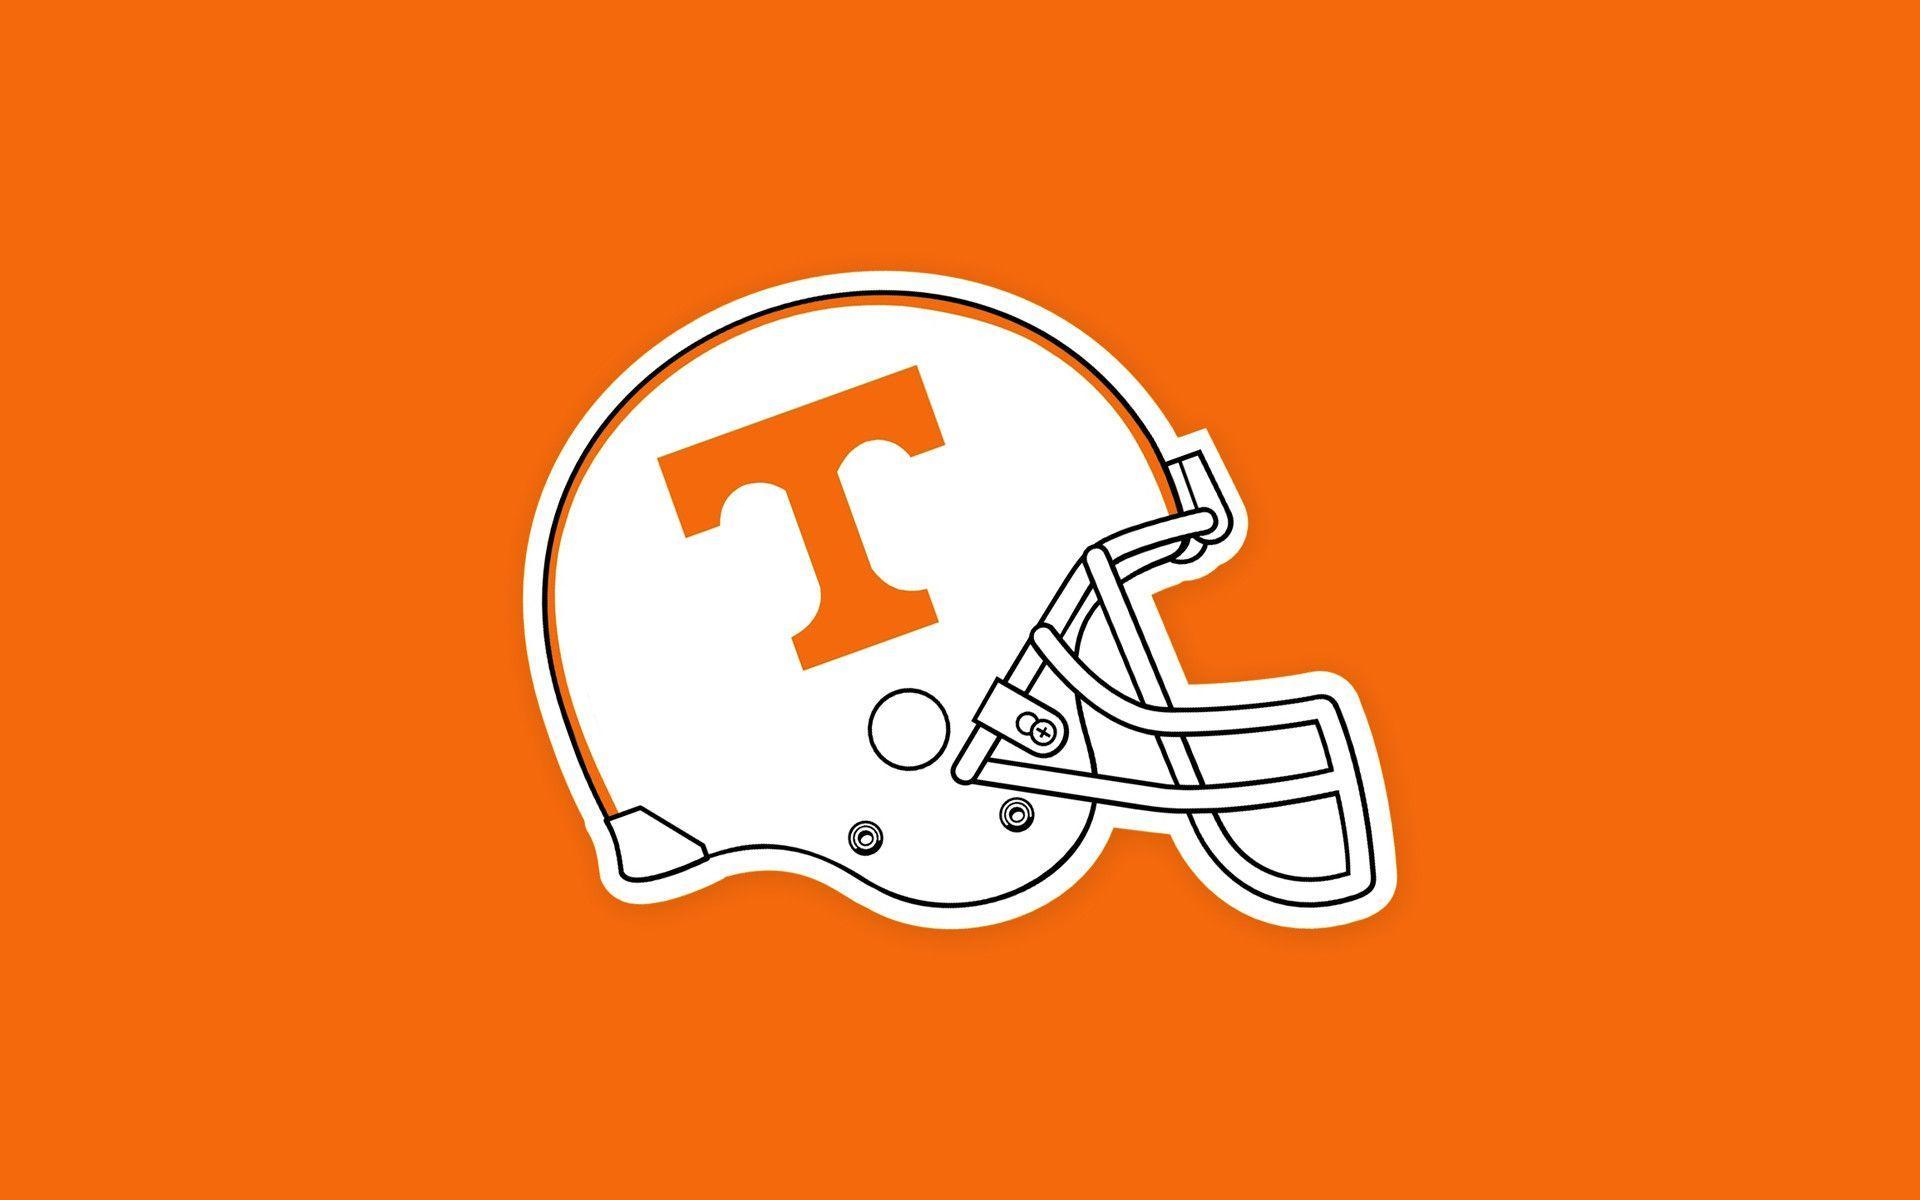 Tennessee Volunteers Football Tennessee Volunteers Men's Basketball  American Football Clip Art, PNG, 640x790px, Tennessee Volunteers Football,